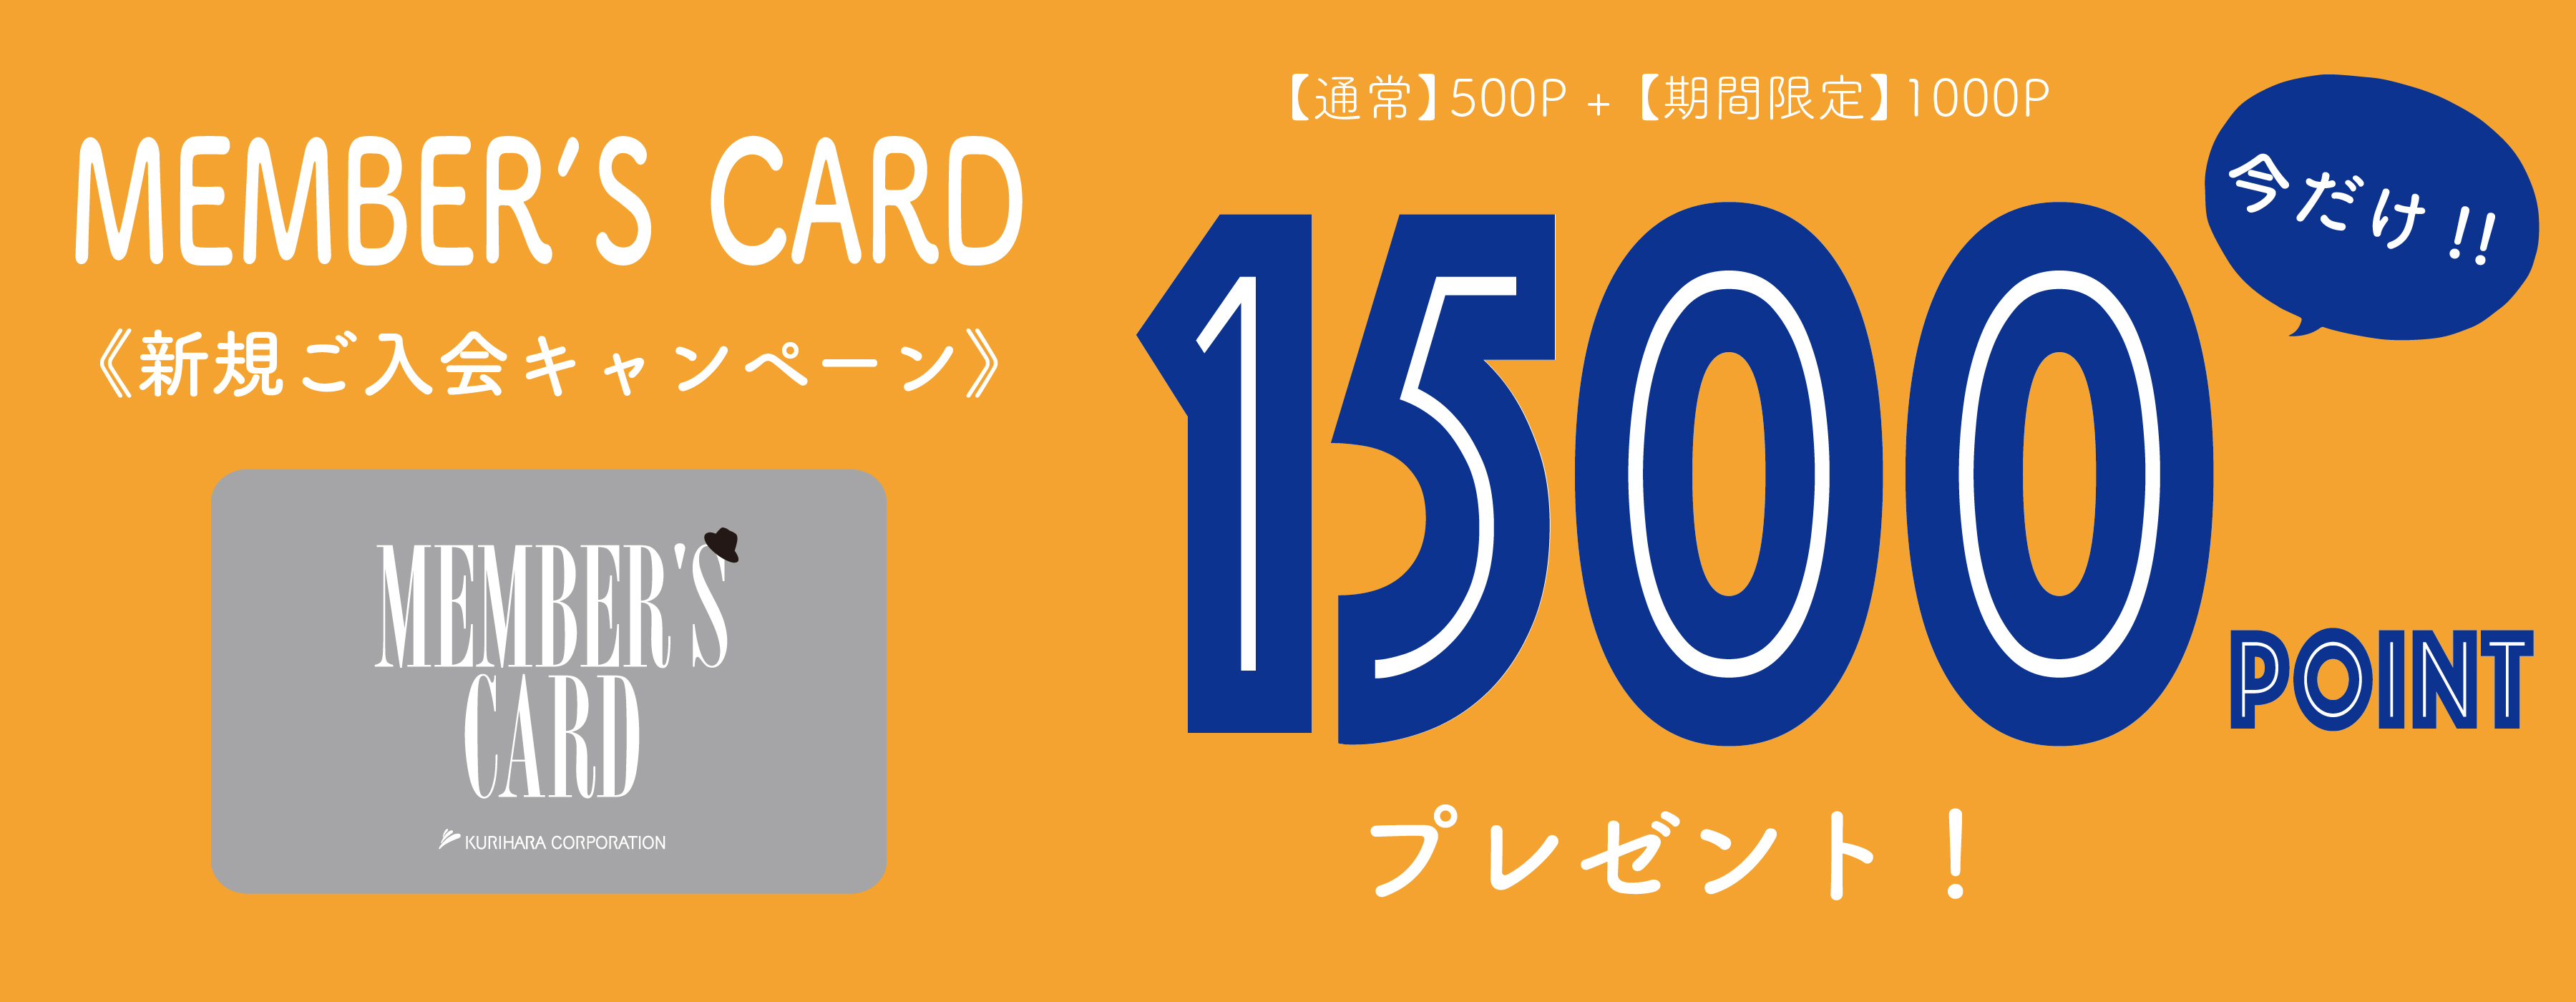 KURIHARAメンバーズカード入会キャンペーン 1500ポイントプレゼント